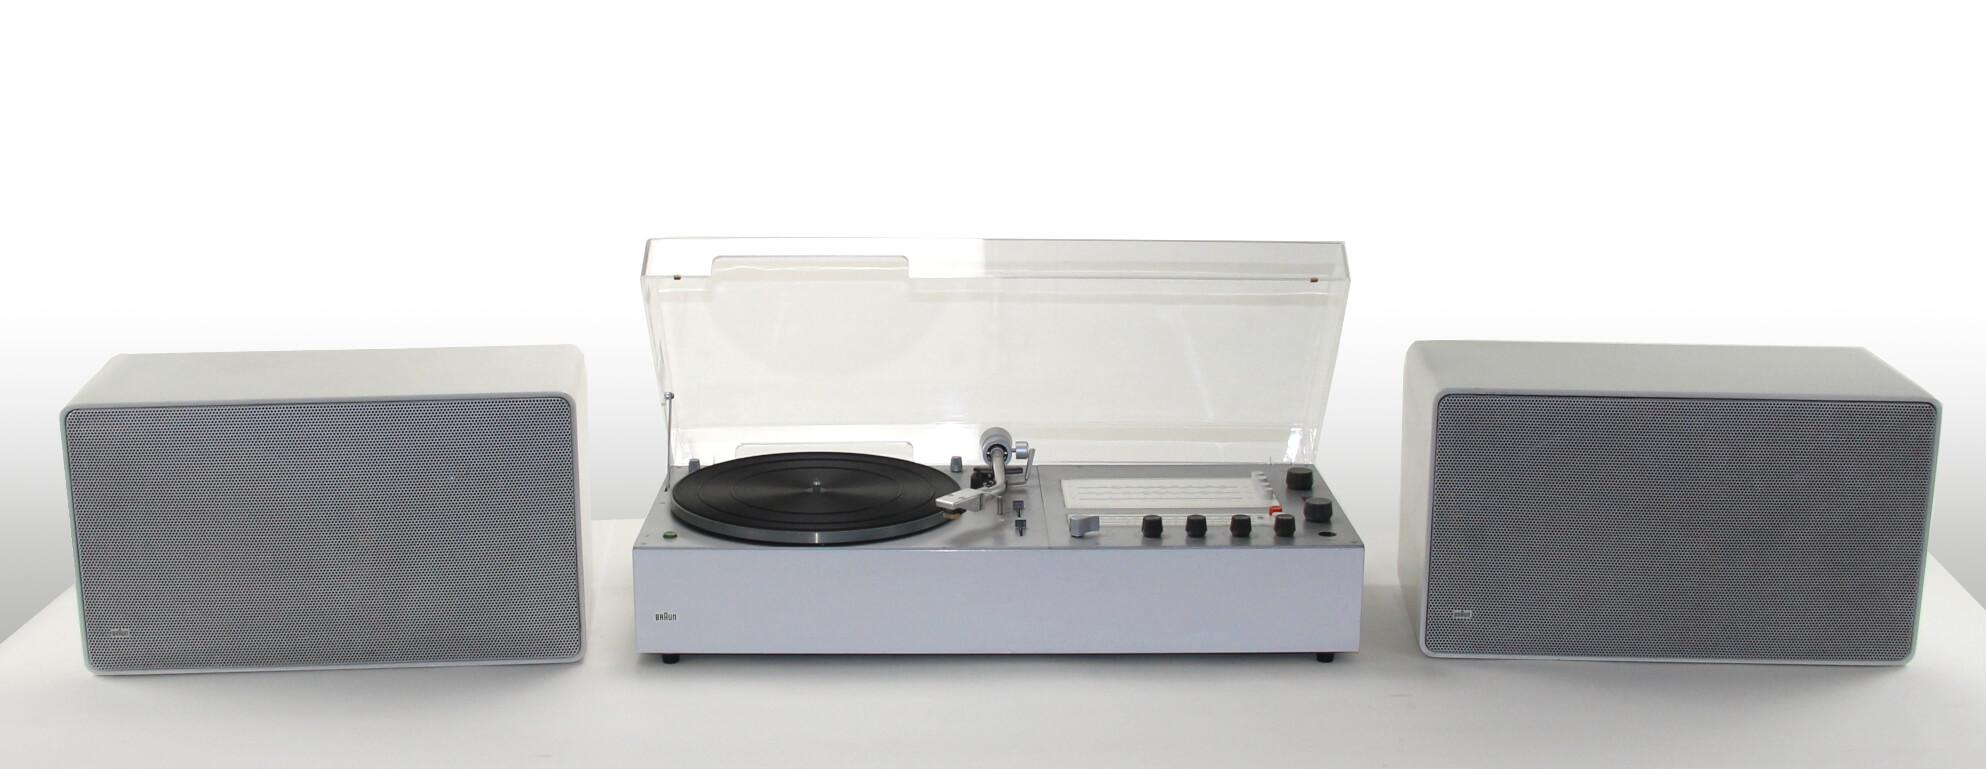 braun audio 310 white & L 625 white